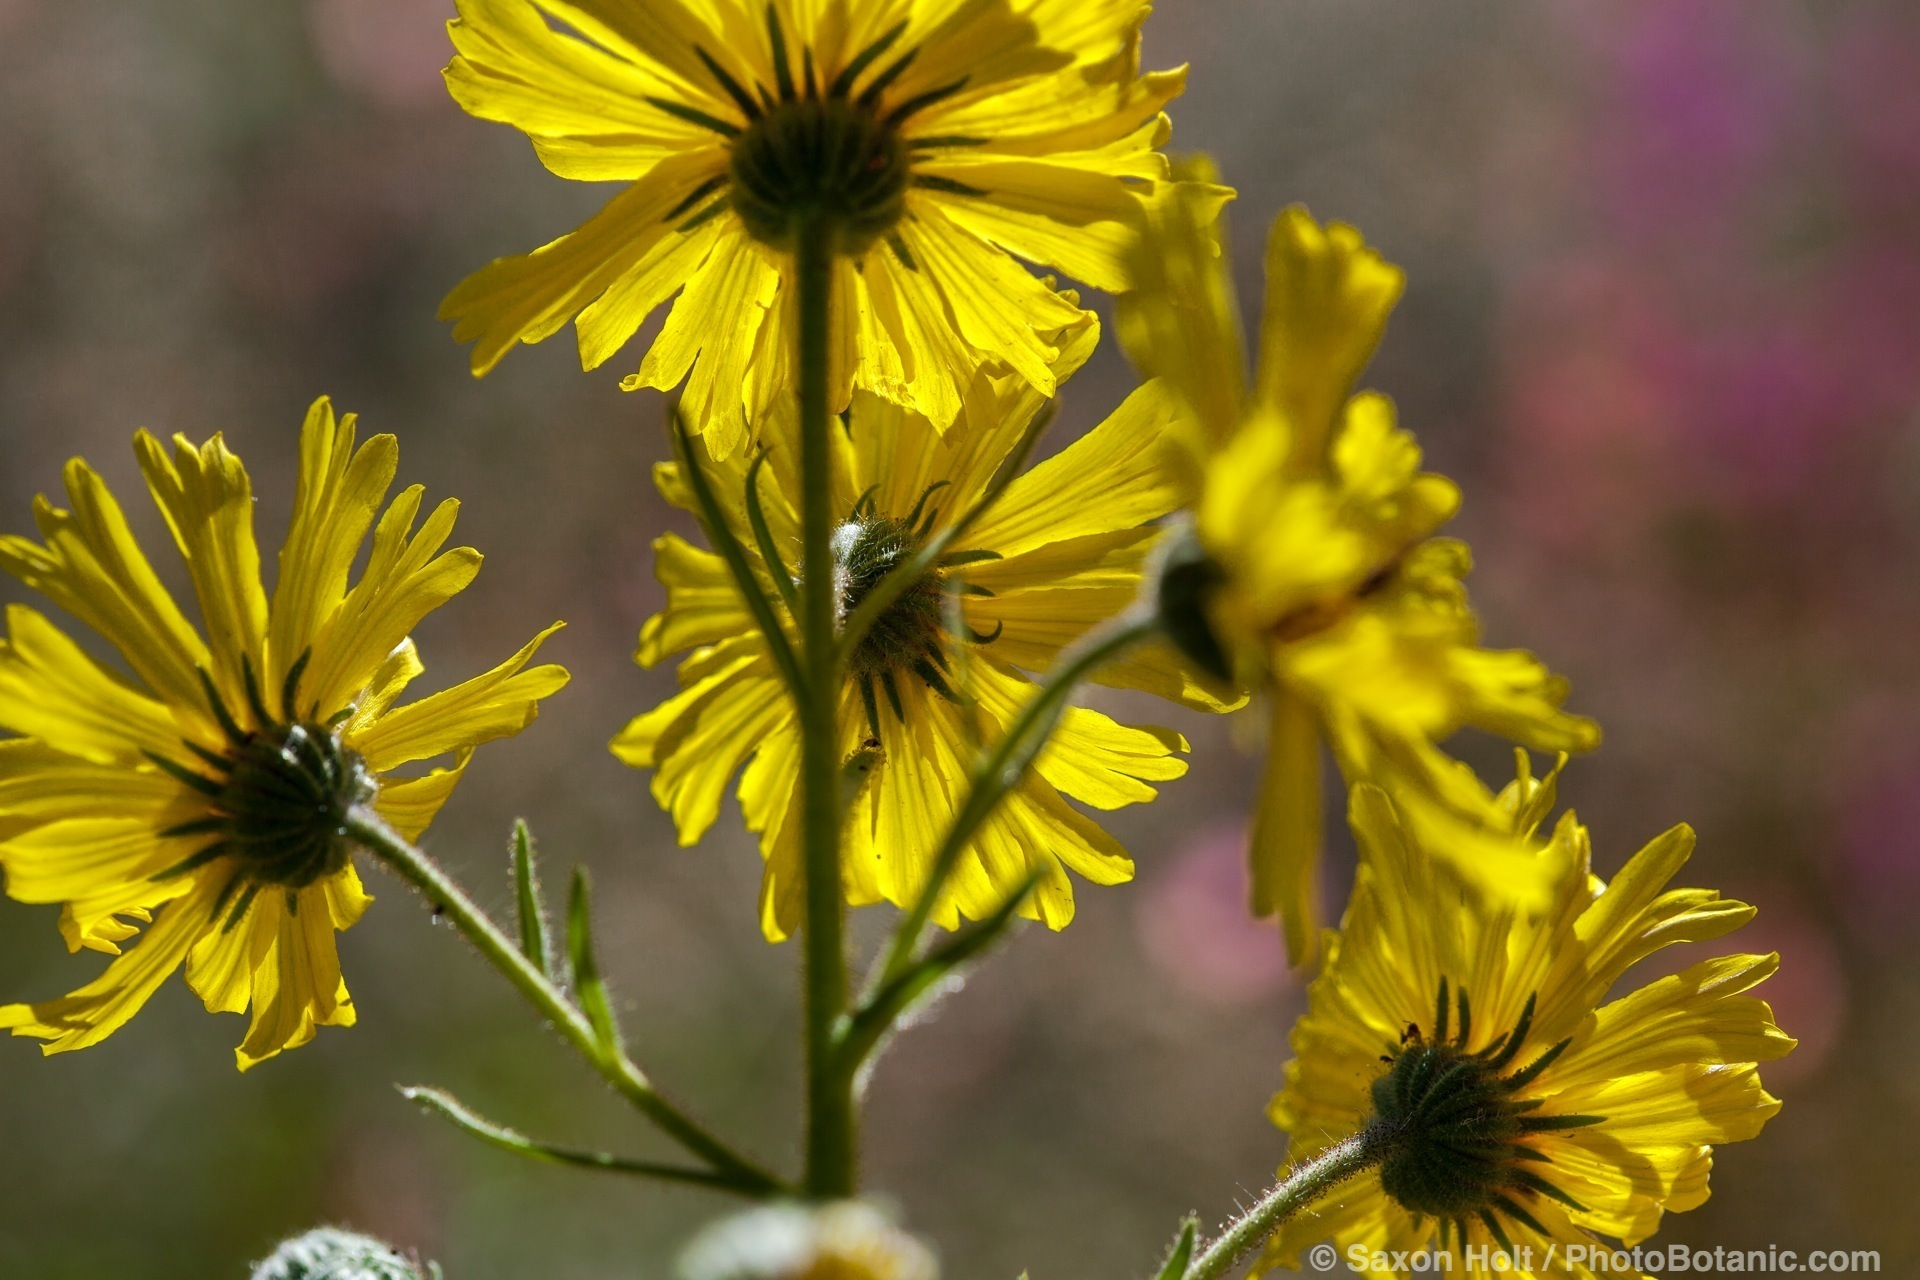 Madia elegans, Elegant tarweed, yellow flowering wildflower California native plant at Los Angeles Natural History Museum